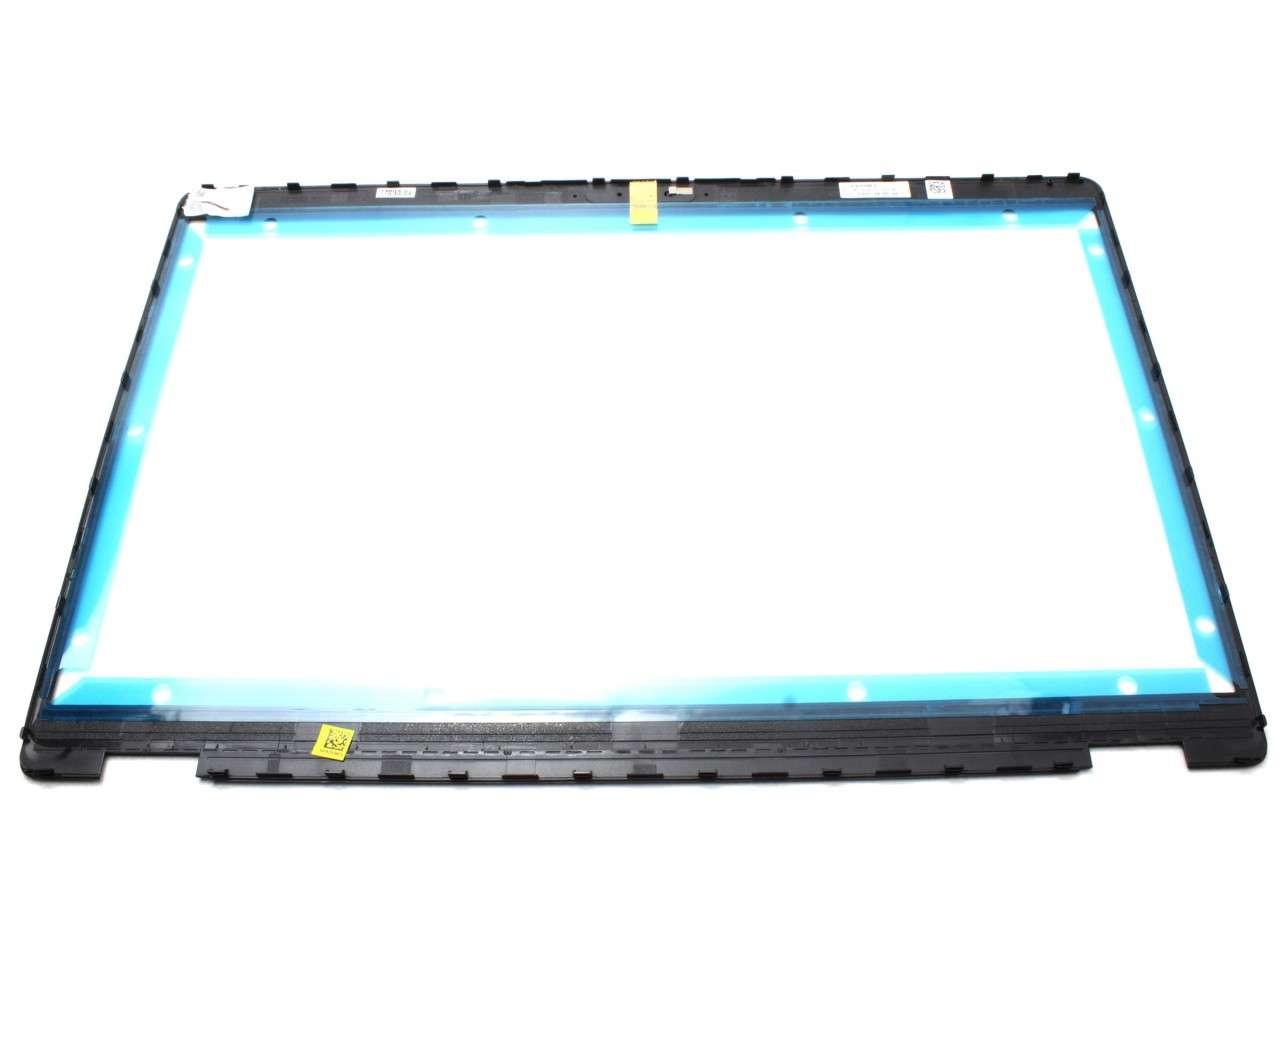 Rama Display Dell Latitude E5500 Bezel Front Cover Neagra imagine powerlaptop.ro 2021